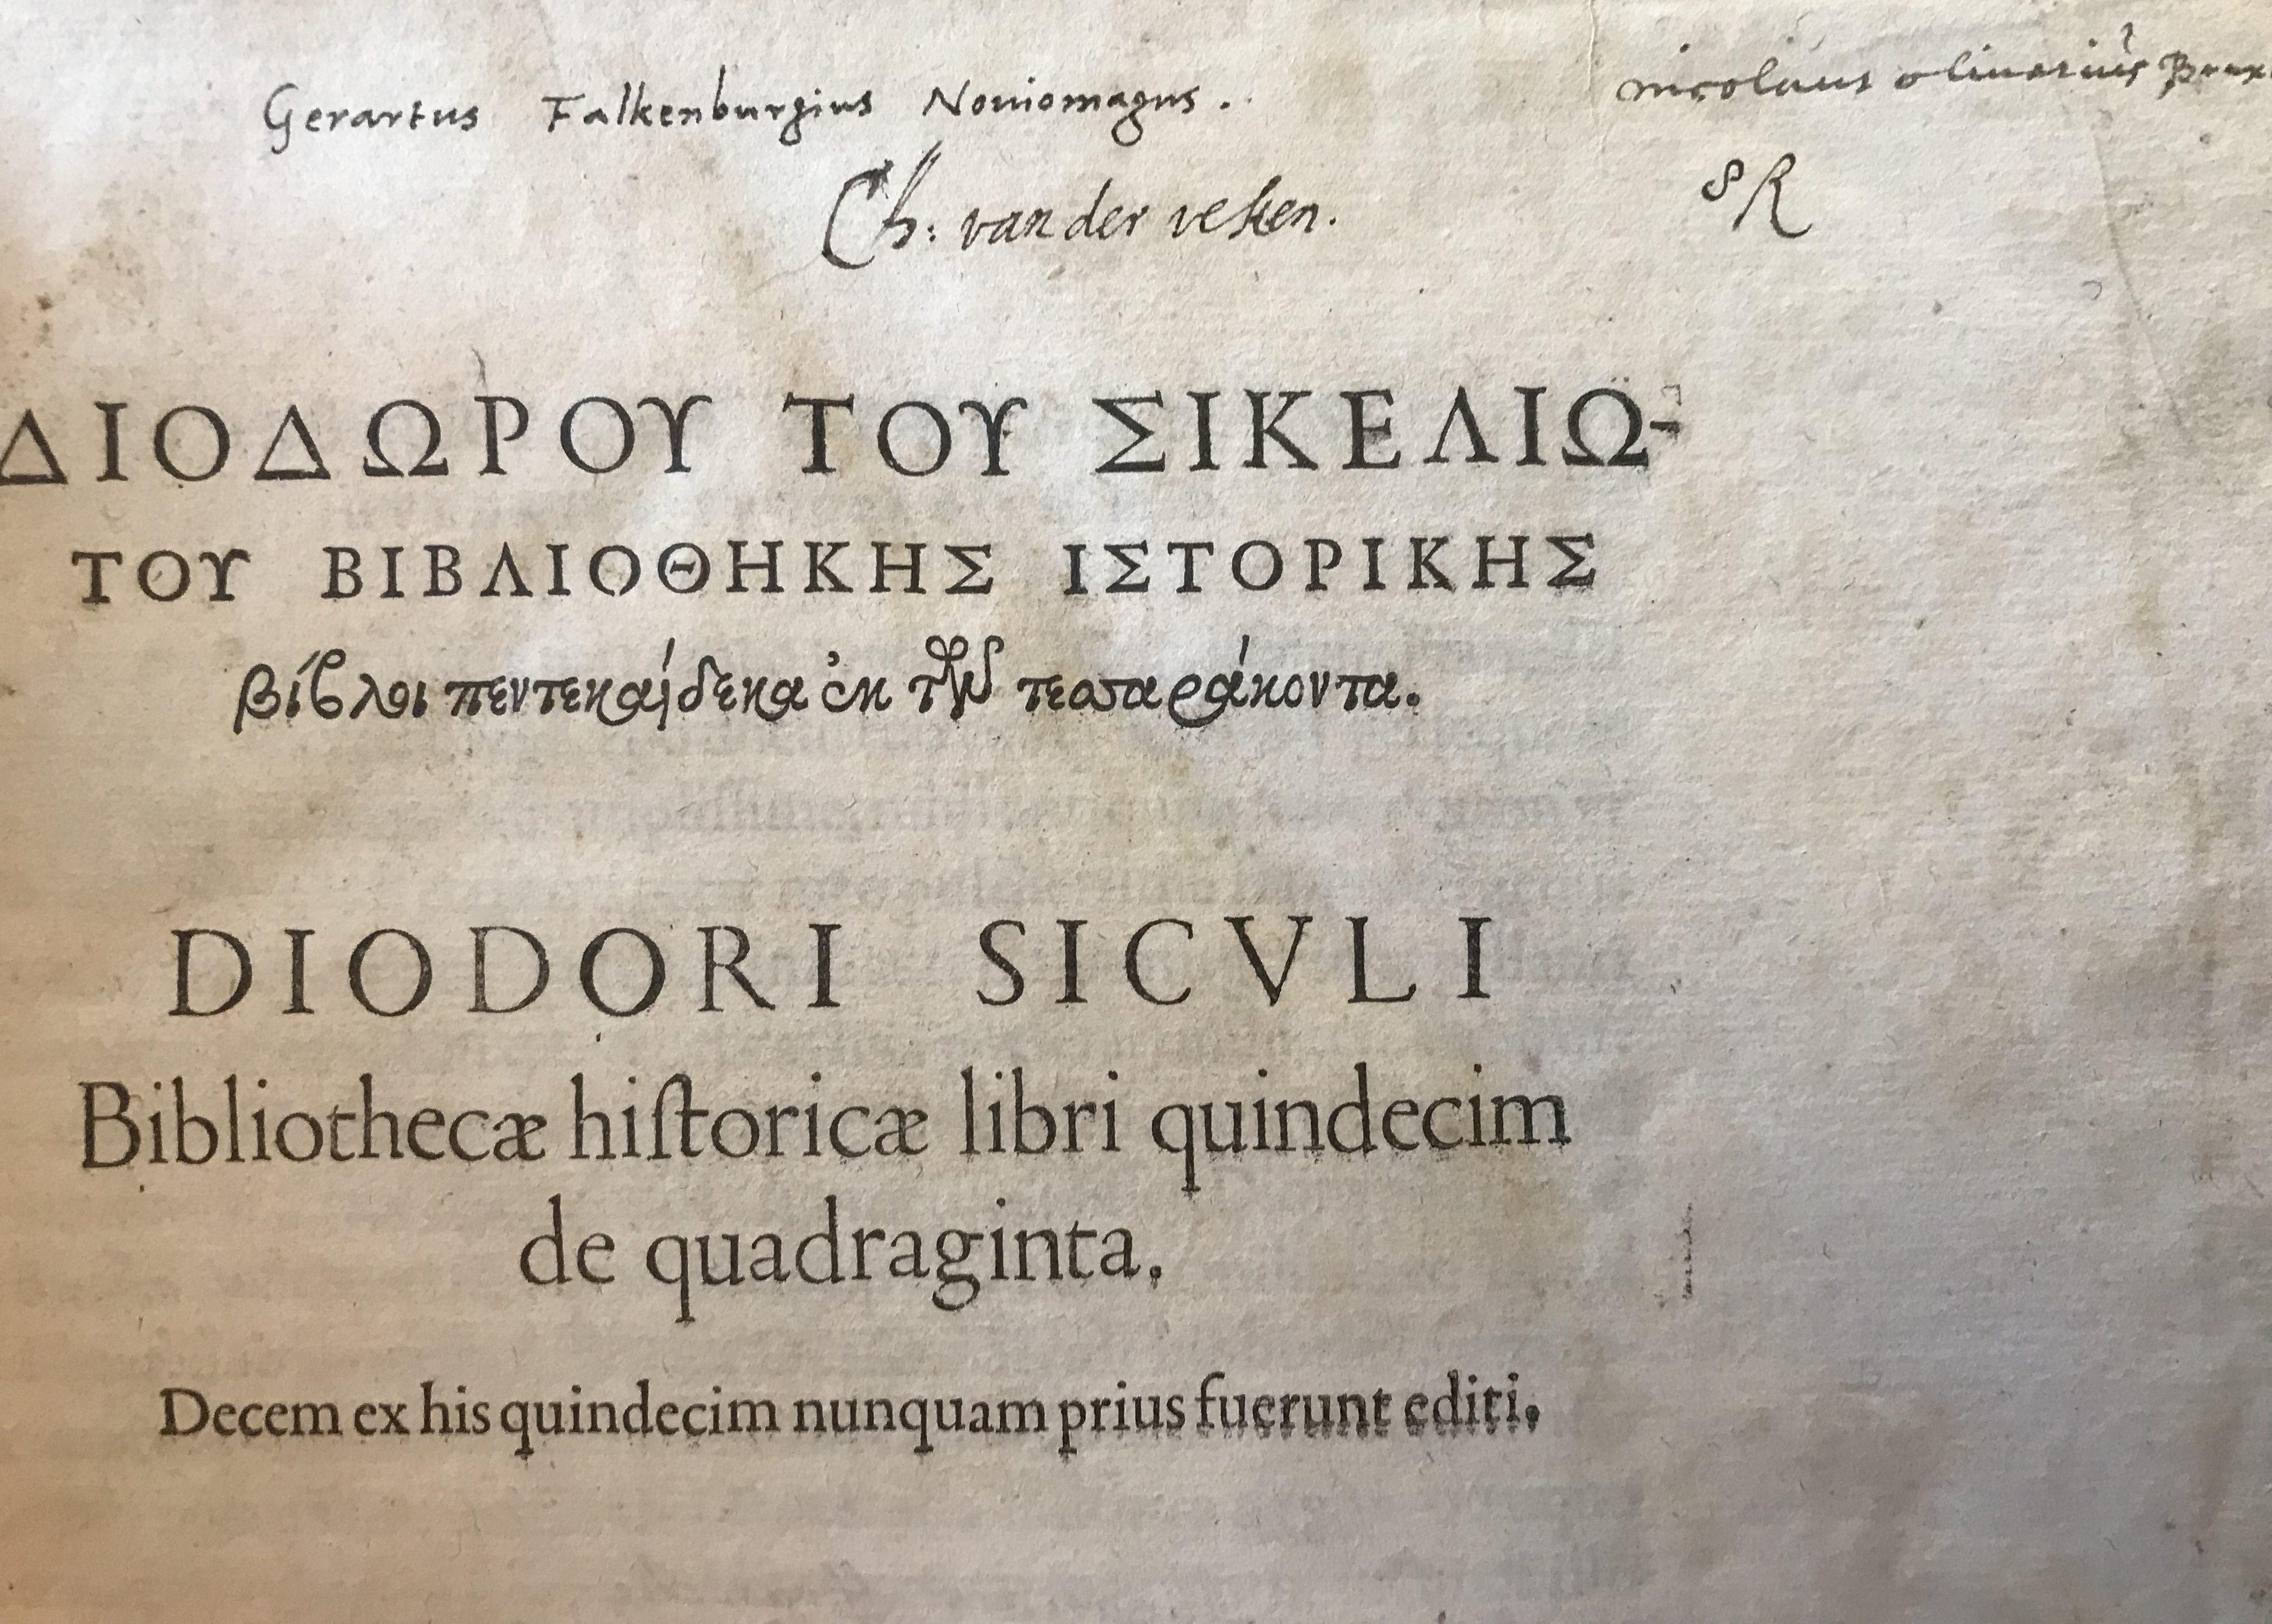 DIODORUS SICULUS (FUGGER, Ulrich III)